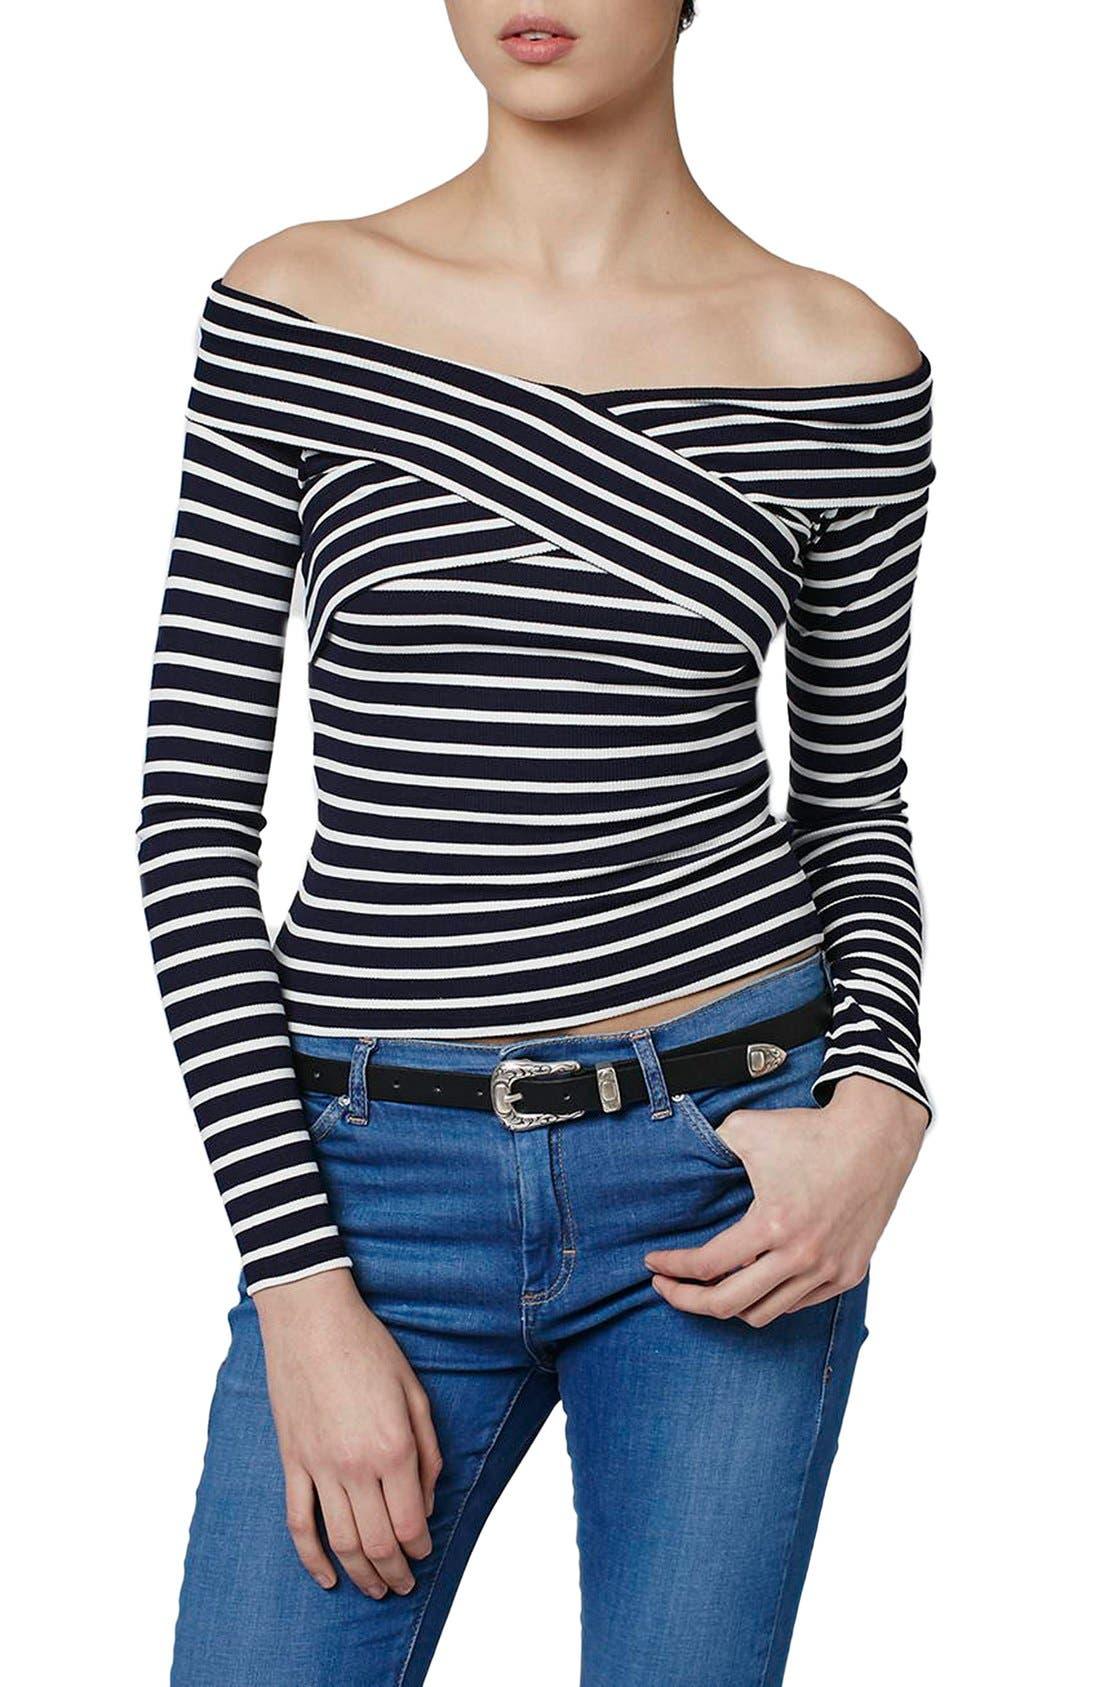 Alternate Image 1 Selected - Topshop Stripe Off the Shoulder Top (Regular & Petite)